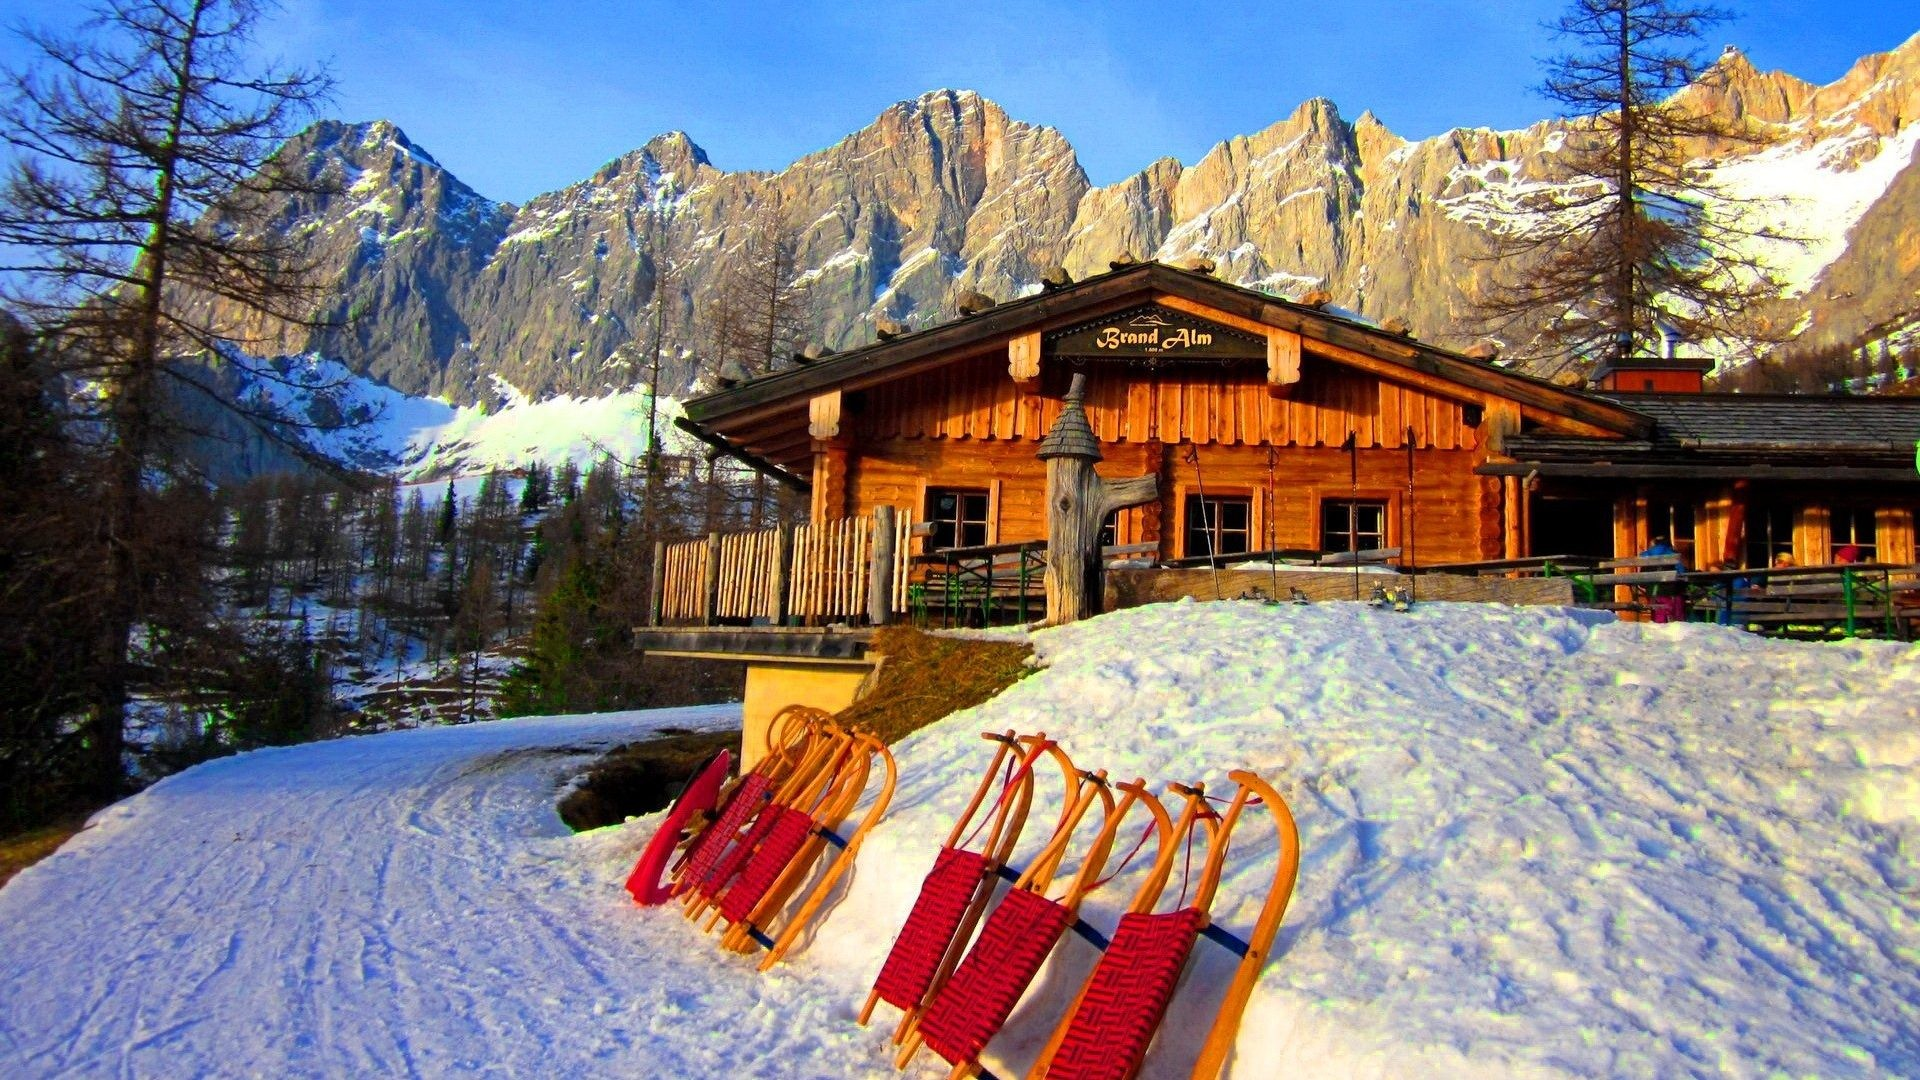 winter cabin wallpaper for desktop 57 images